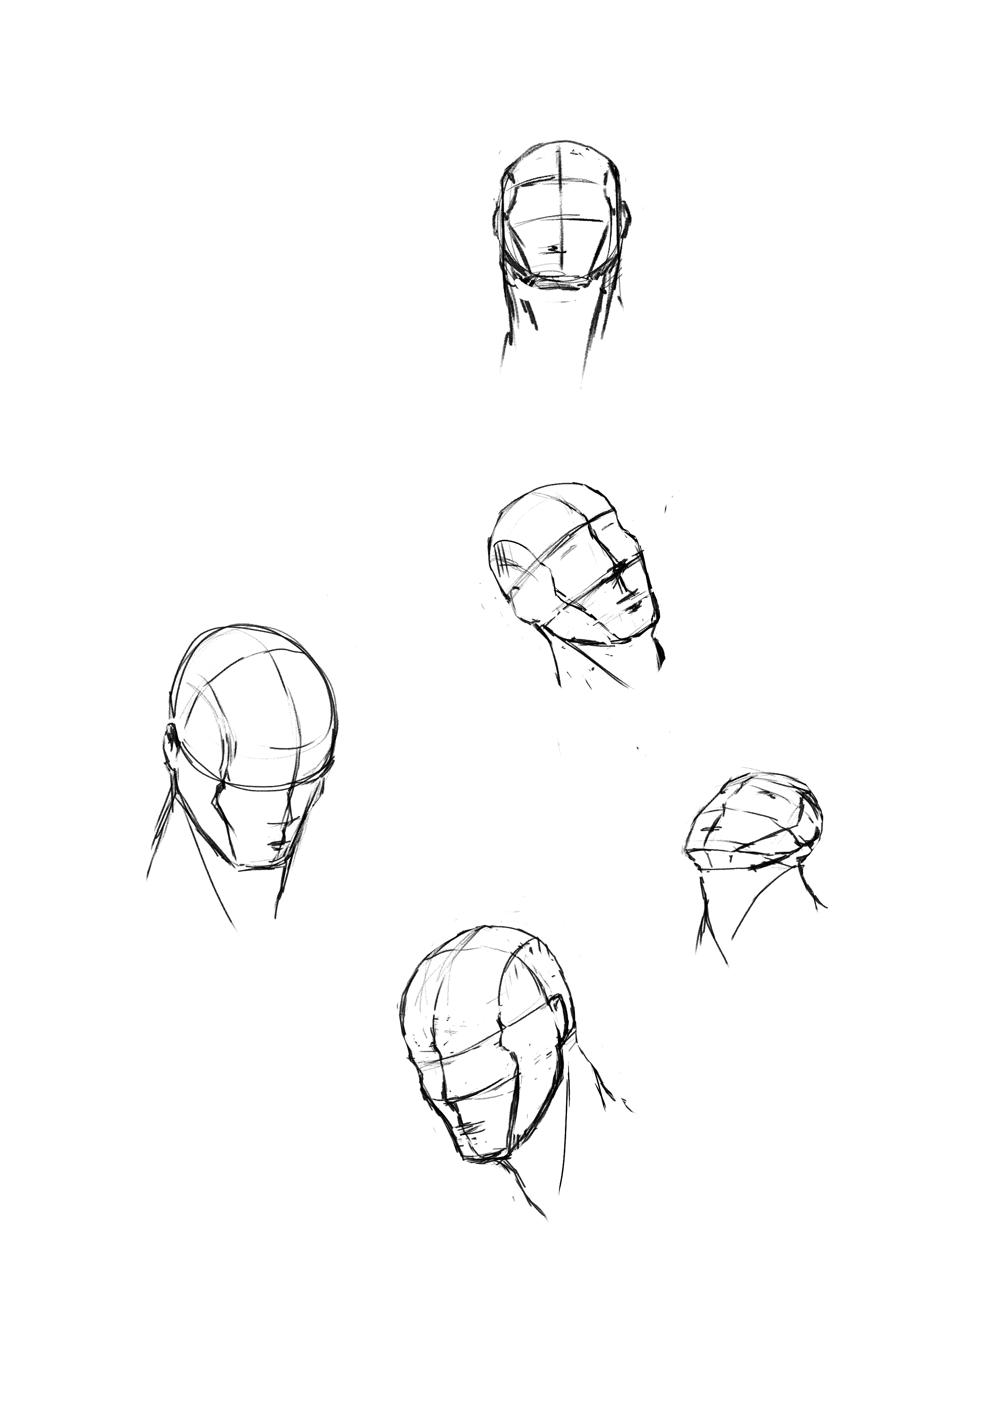 Head Angle Study - image 2 - student project